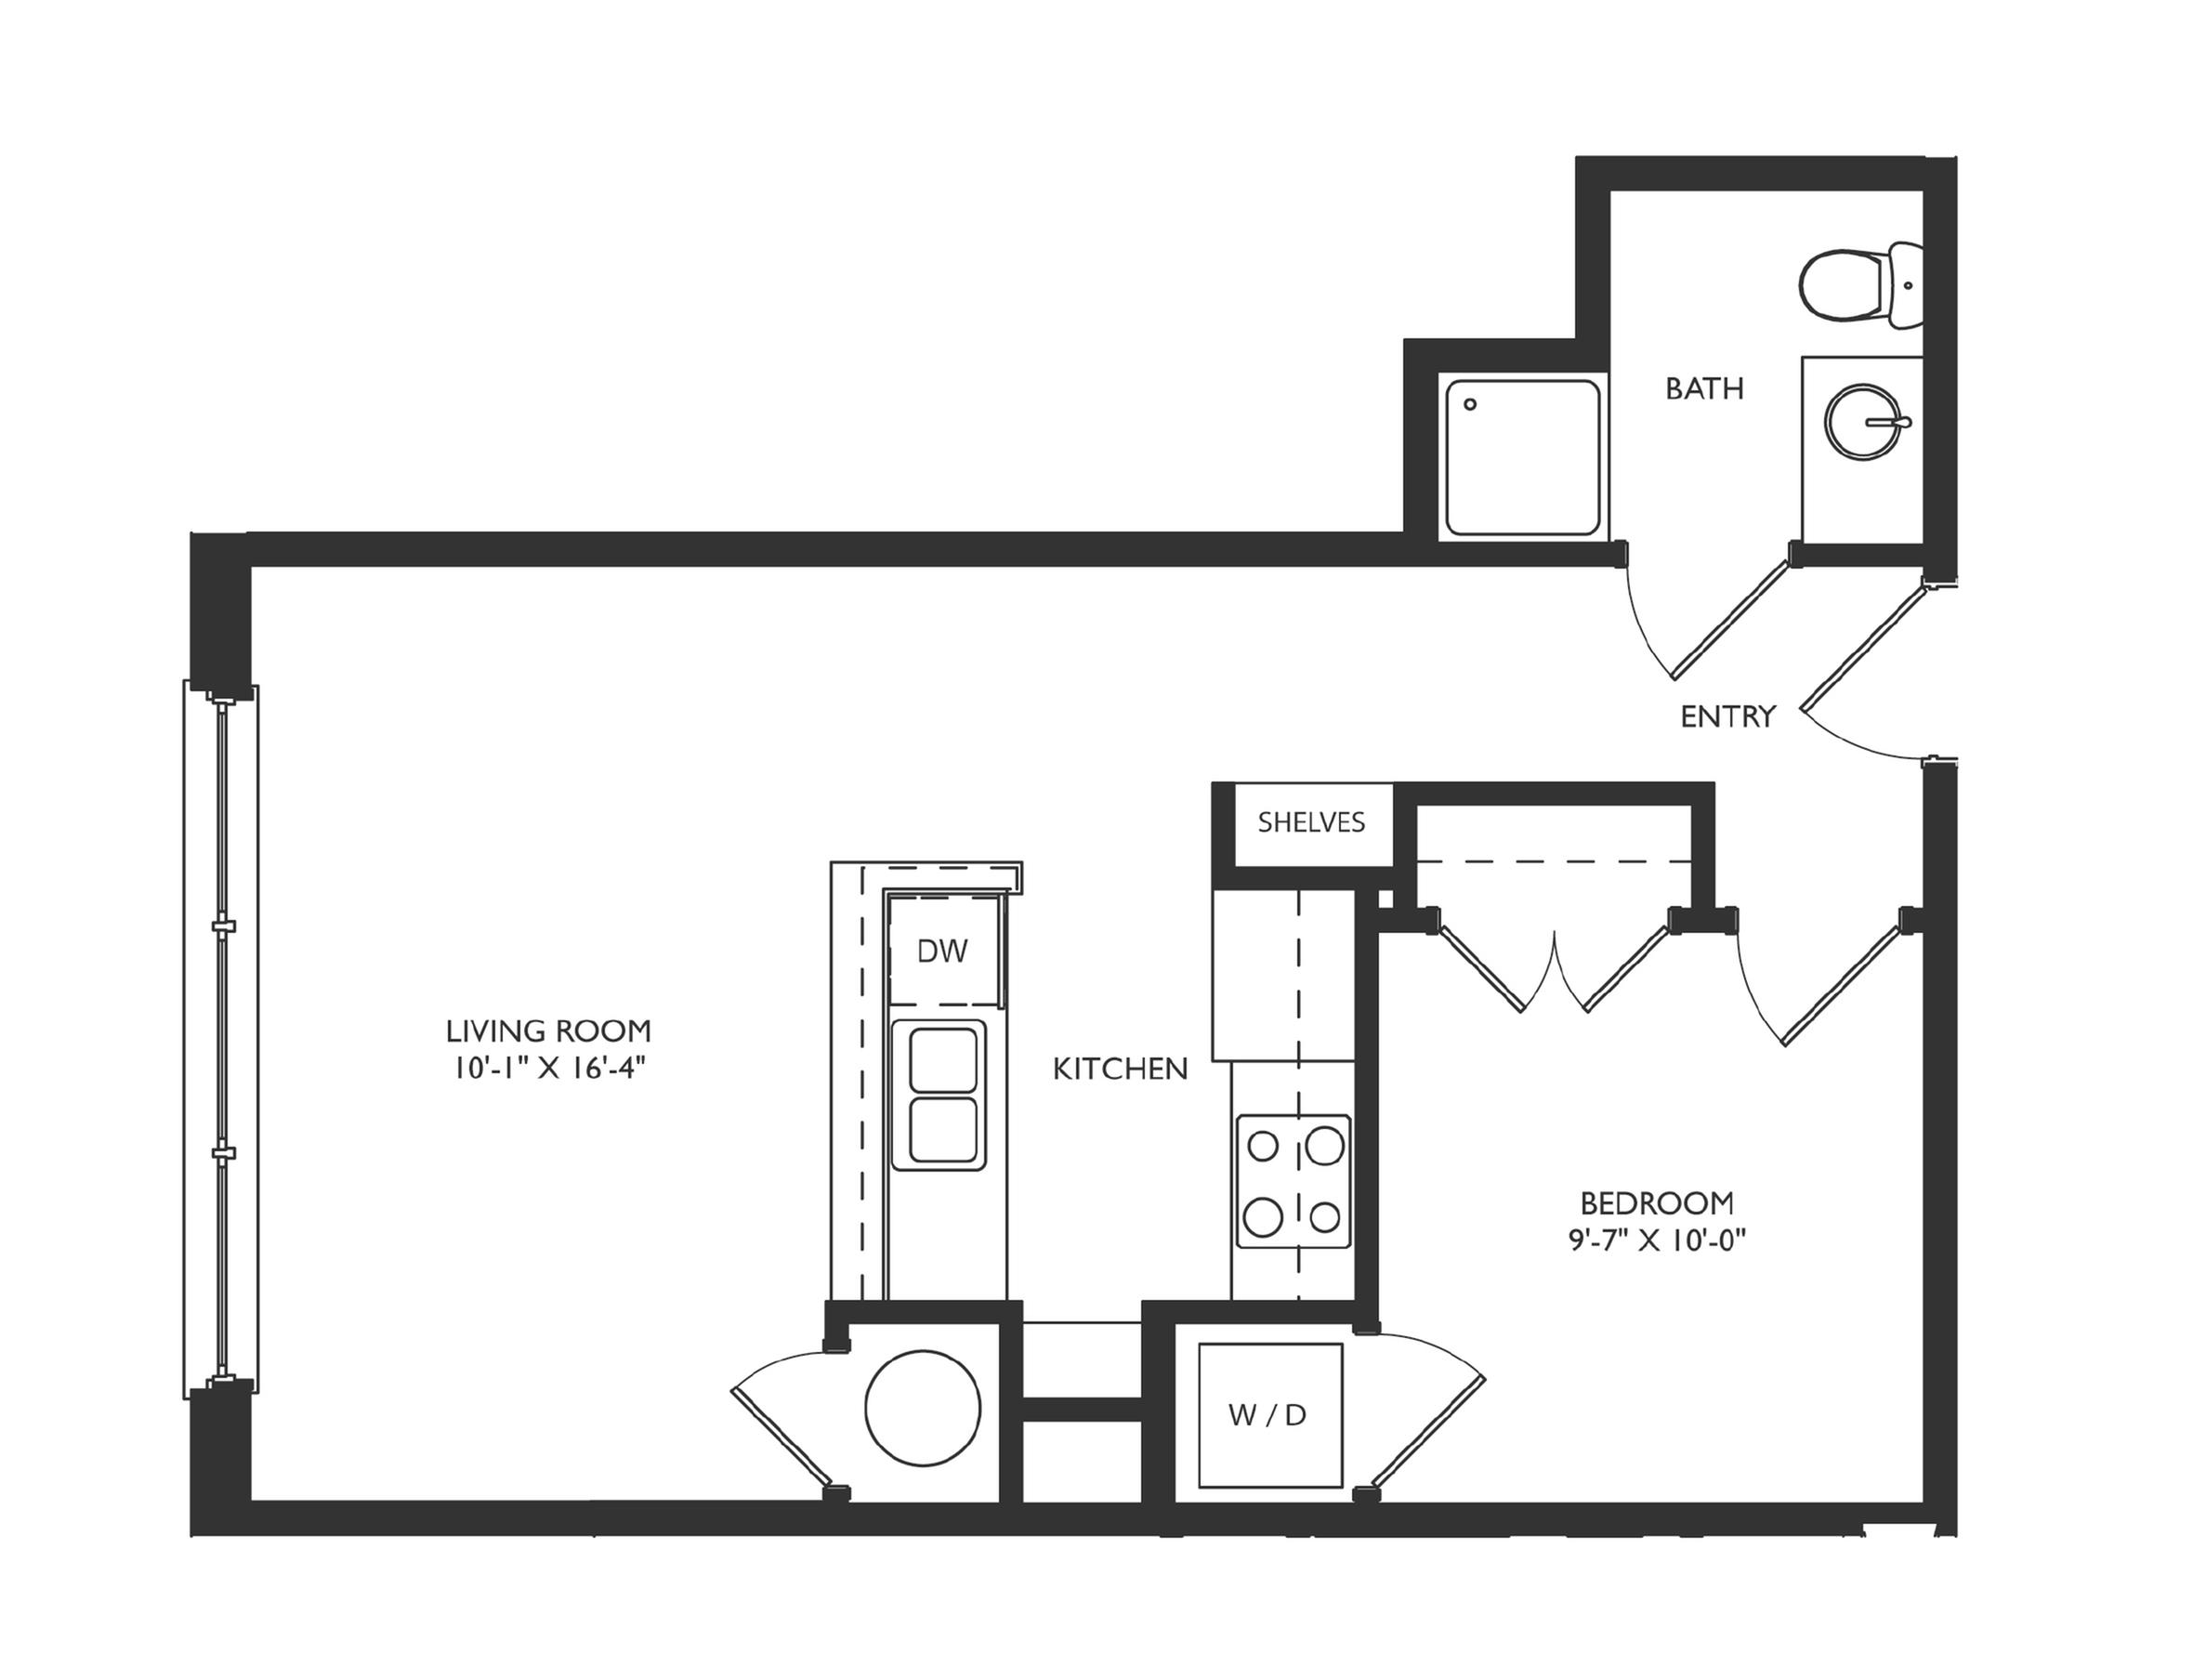 A2a Floor Plan Image